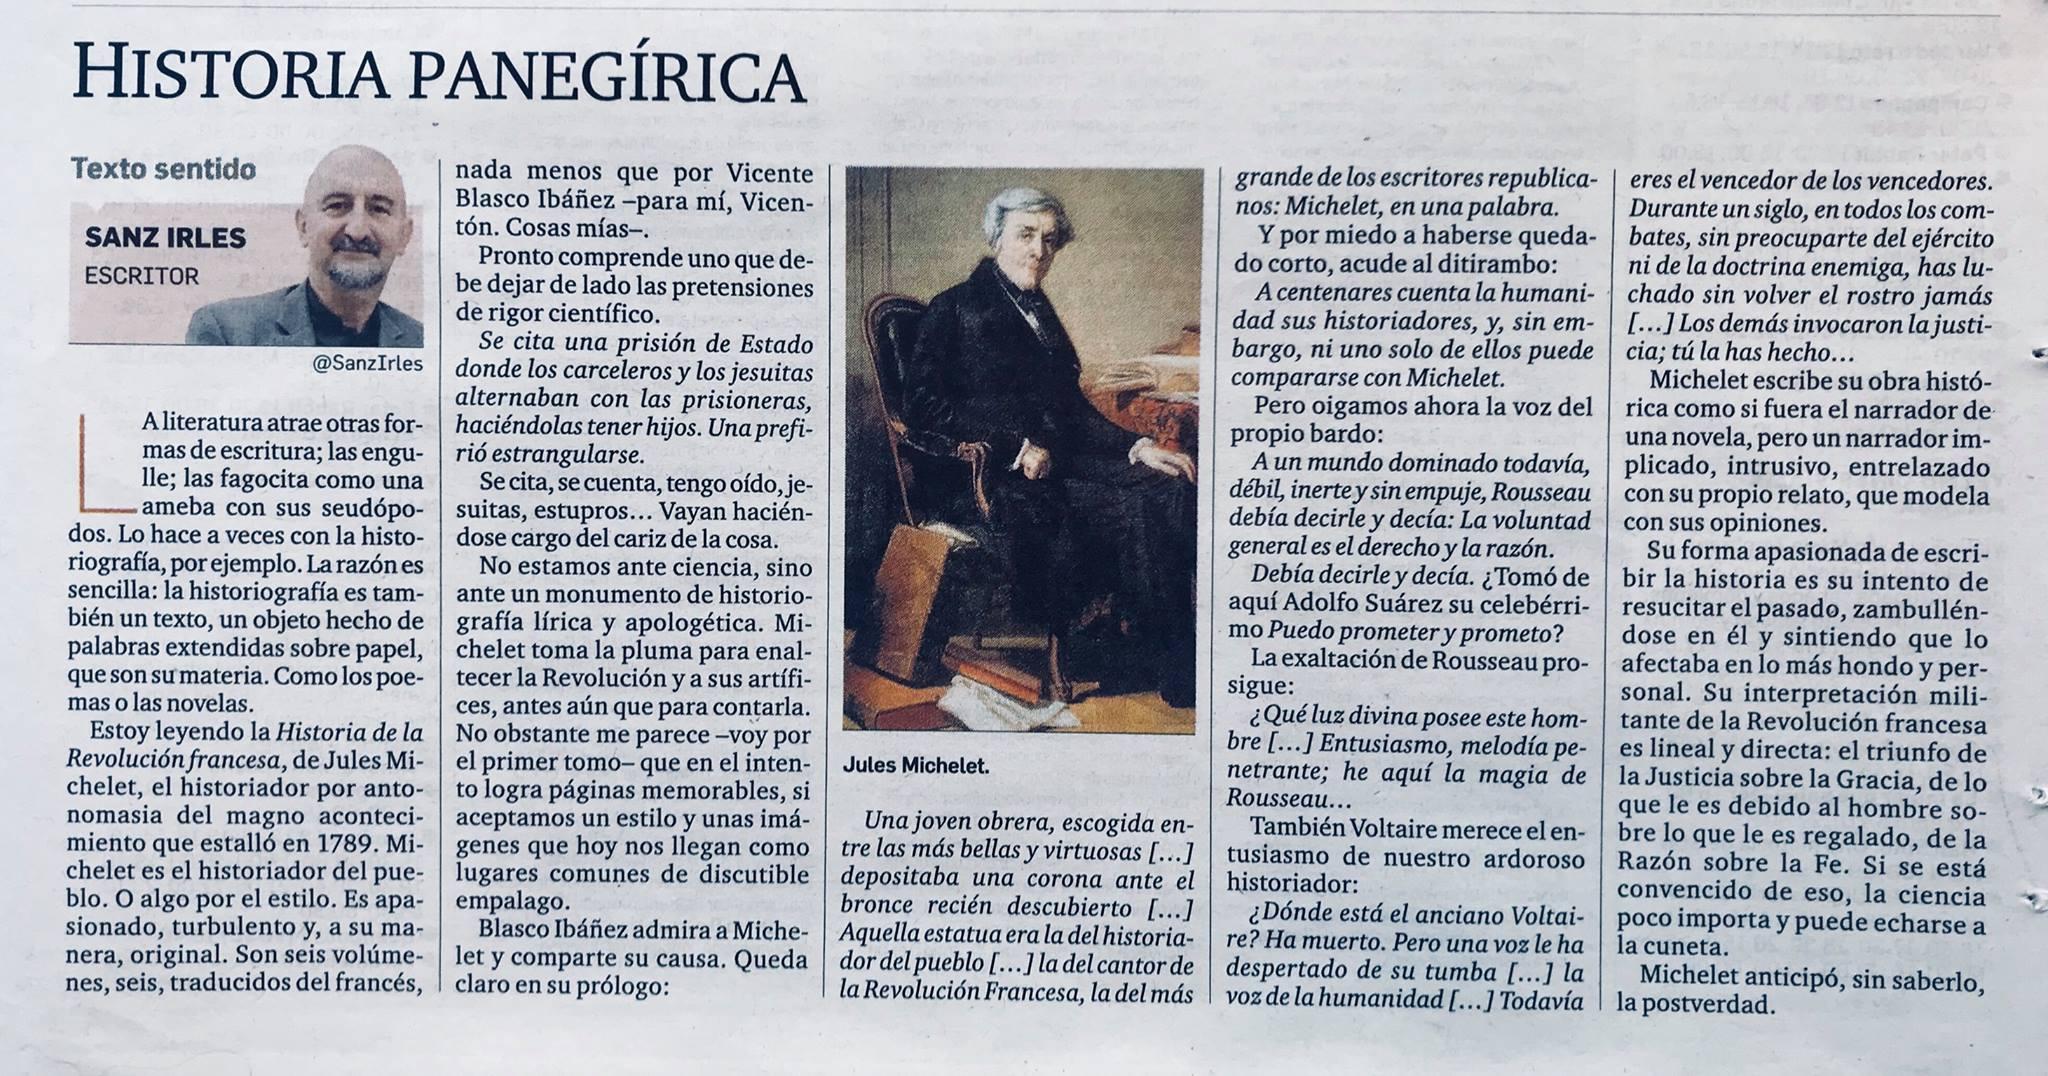 Historia panegírica